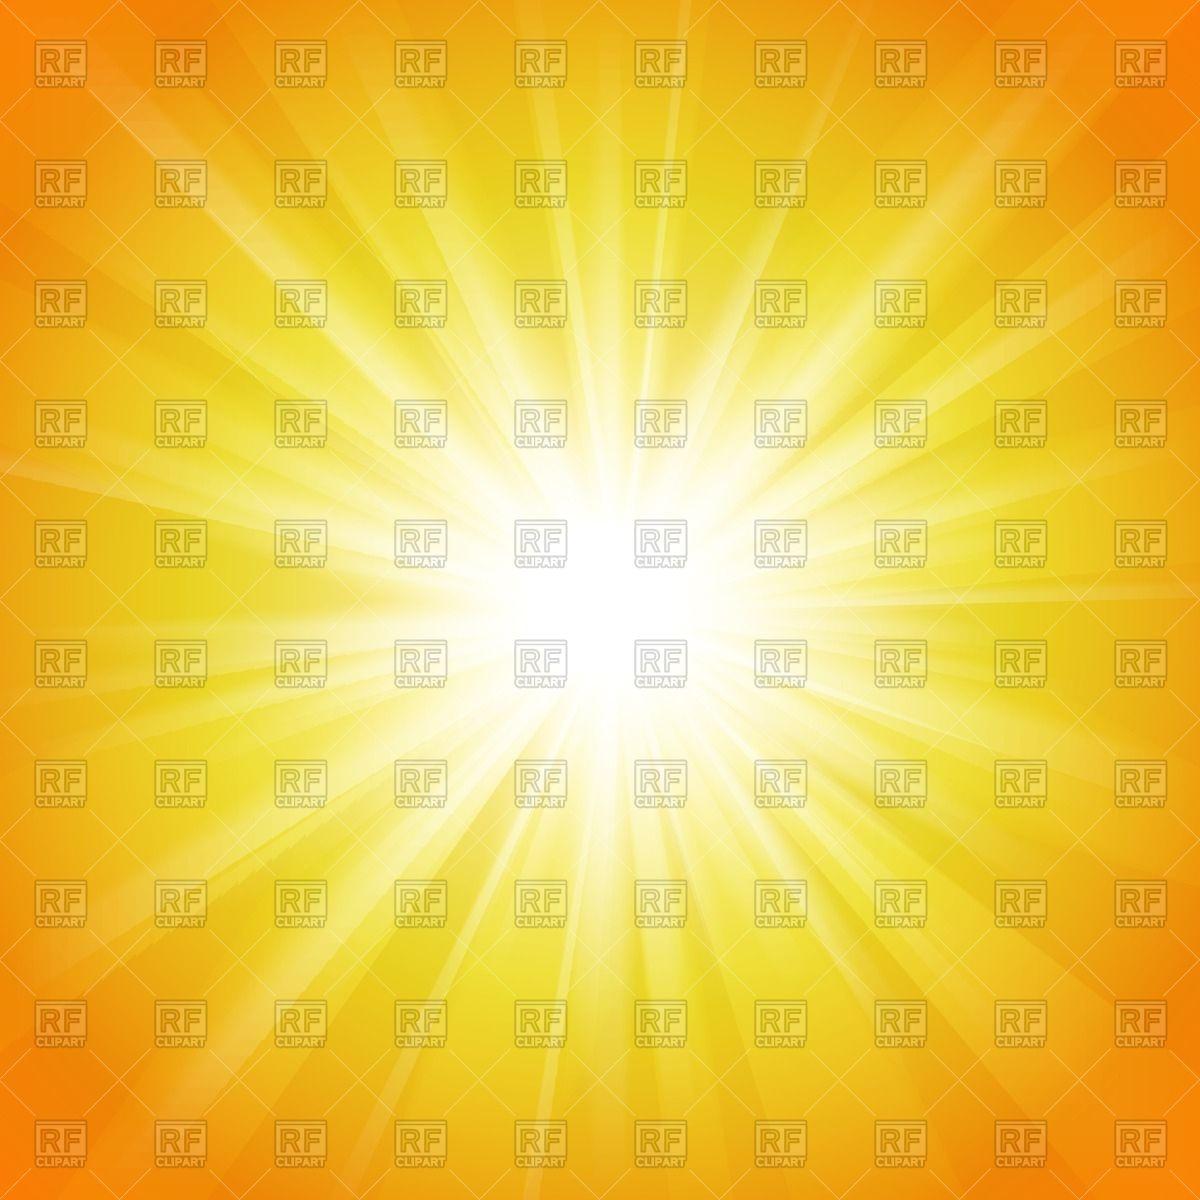 Bright flash of light on orange background Vector Image #40747.